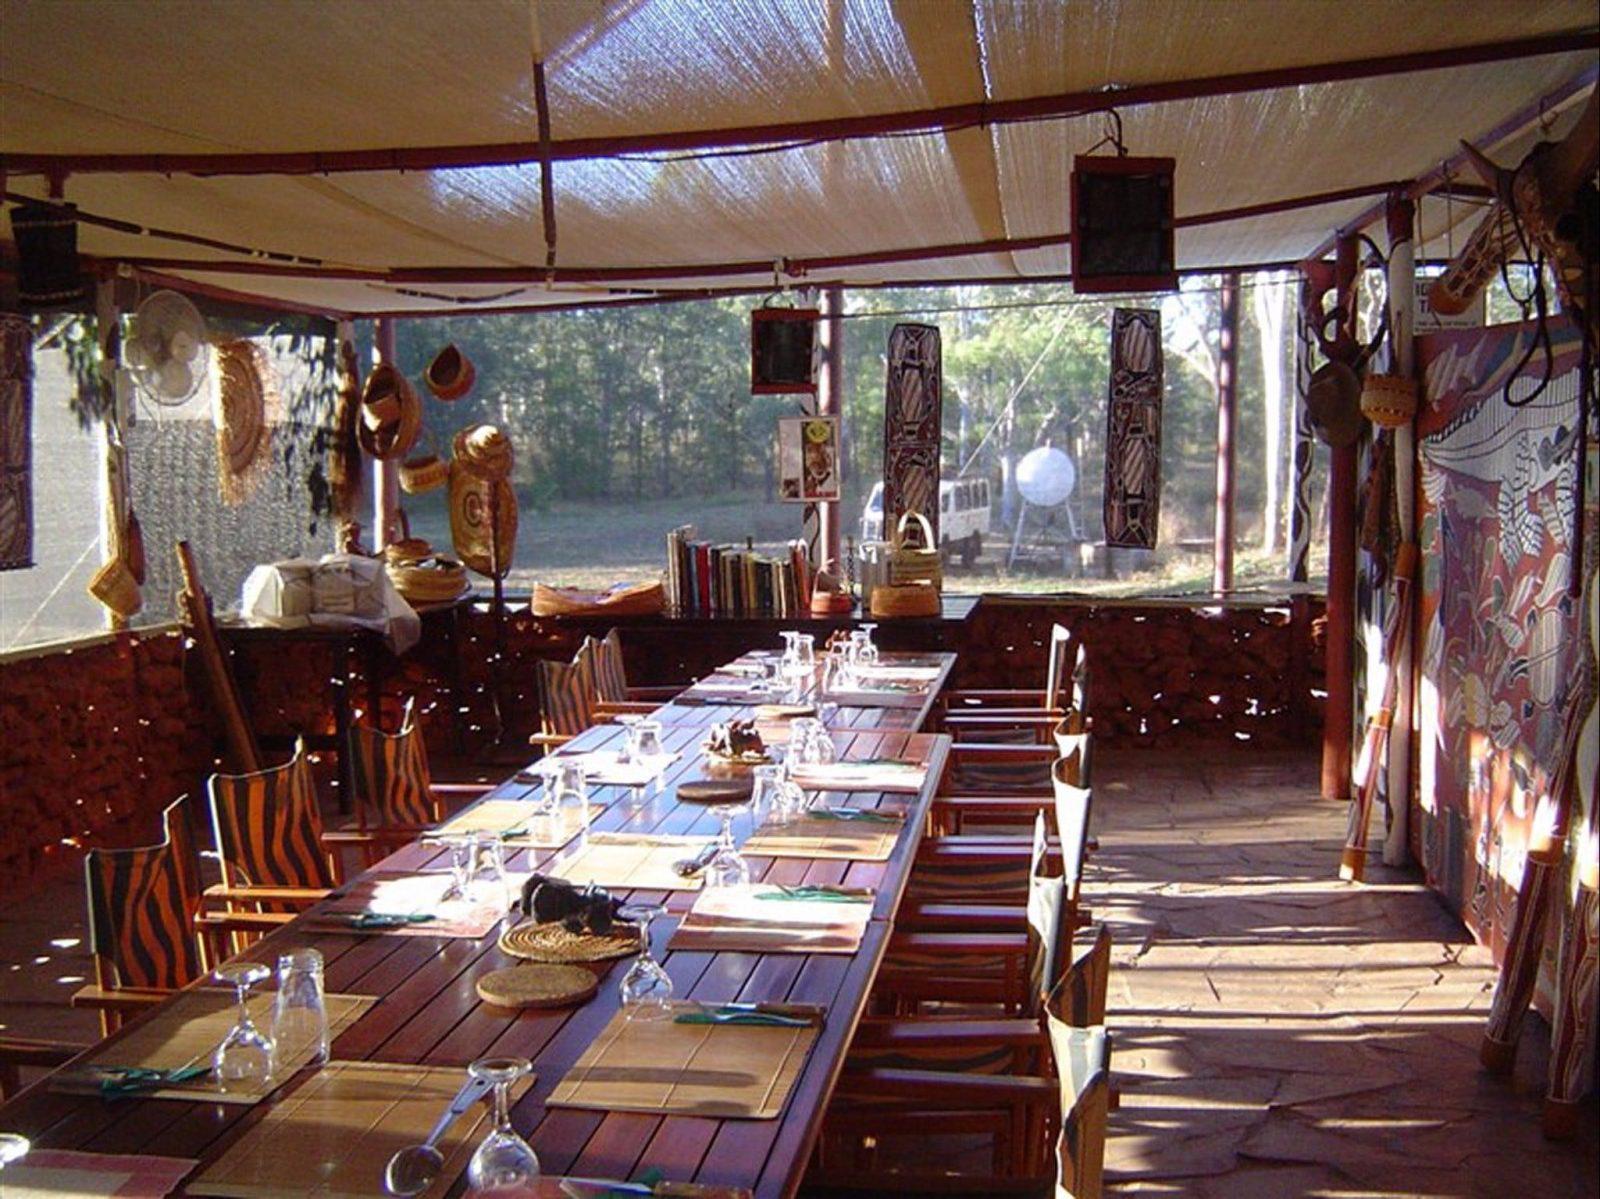 Deamtime Safaris in Central Arnhemland